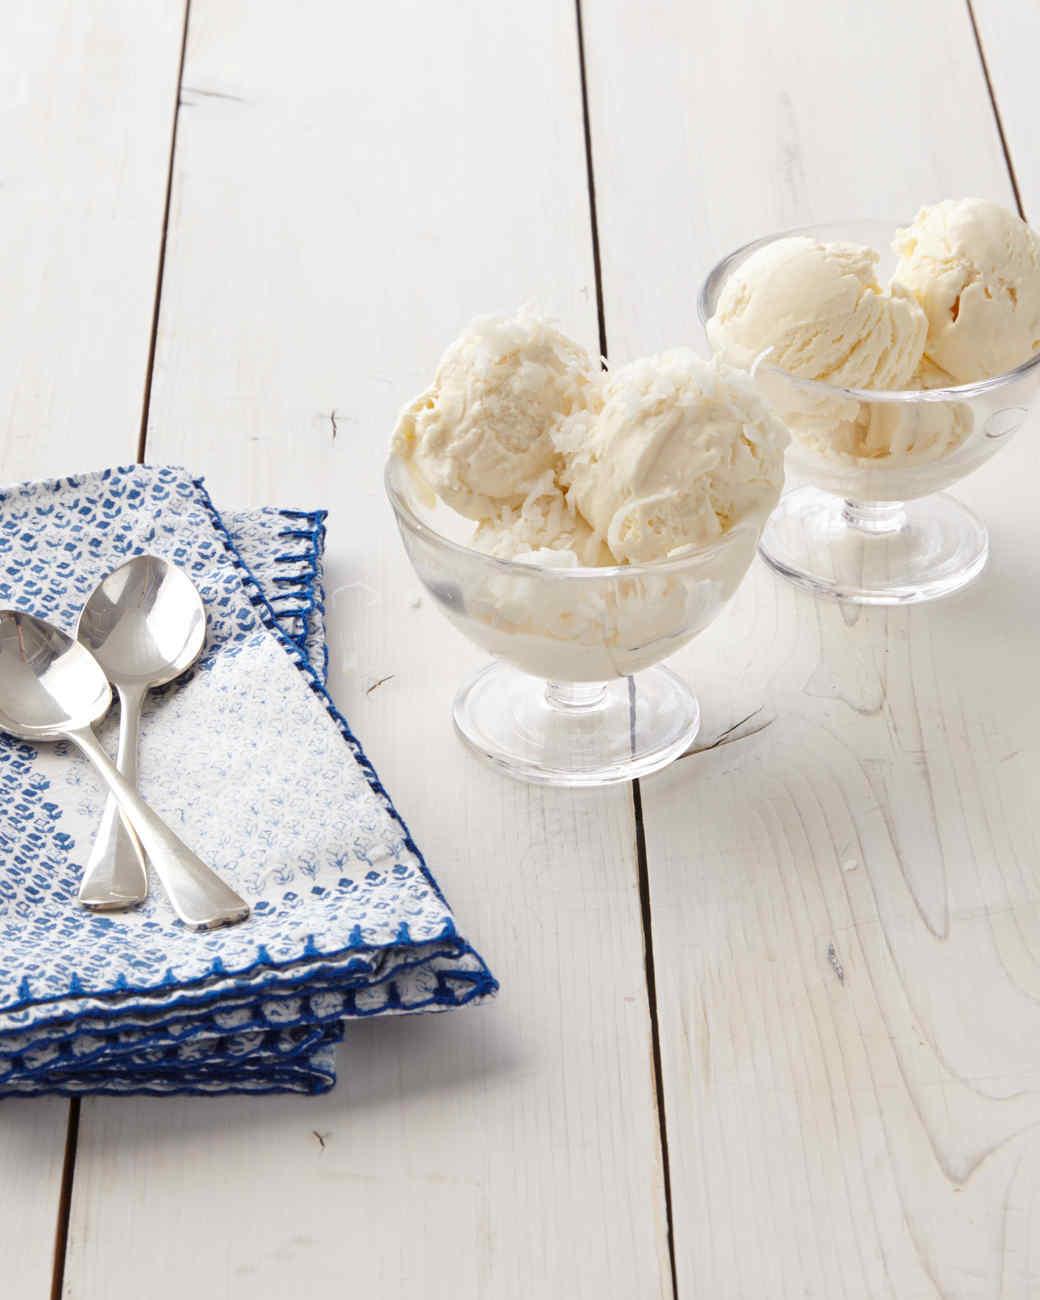 coconut-ice-cream-0026-d112152.jpg